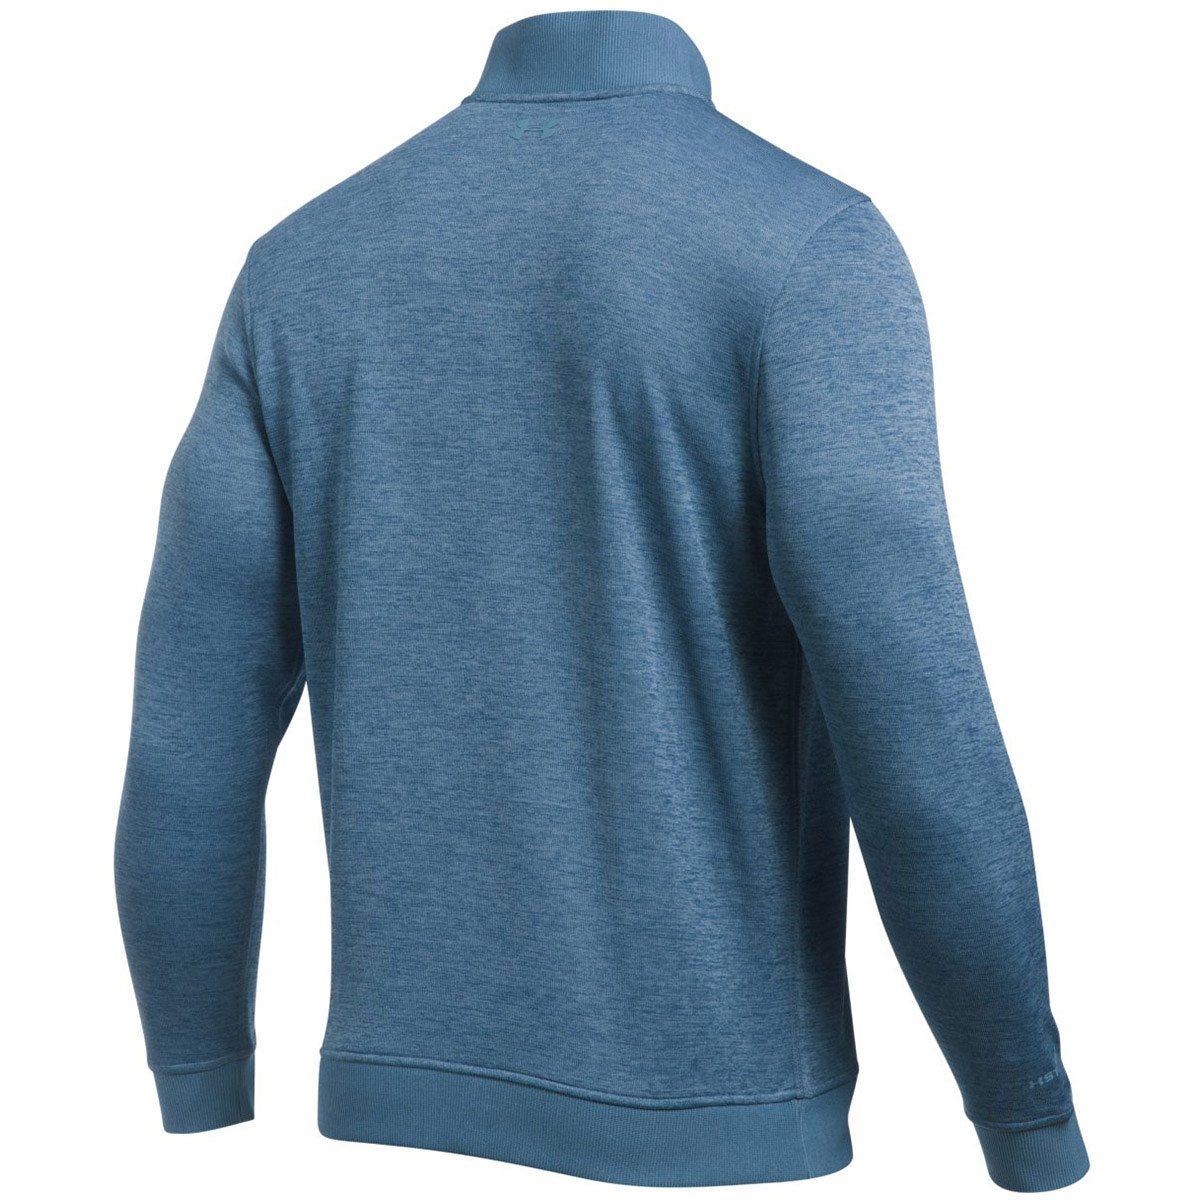 Under-Armour-Mens-UA-Storm-Sweater-Fleece-1-4-Zip-Pullover-Jumper-25-OFF-RRP thumbnail 24